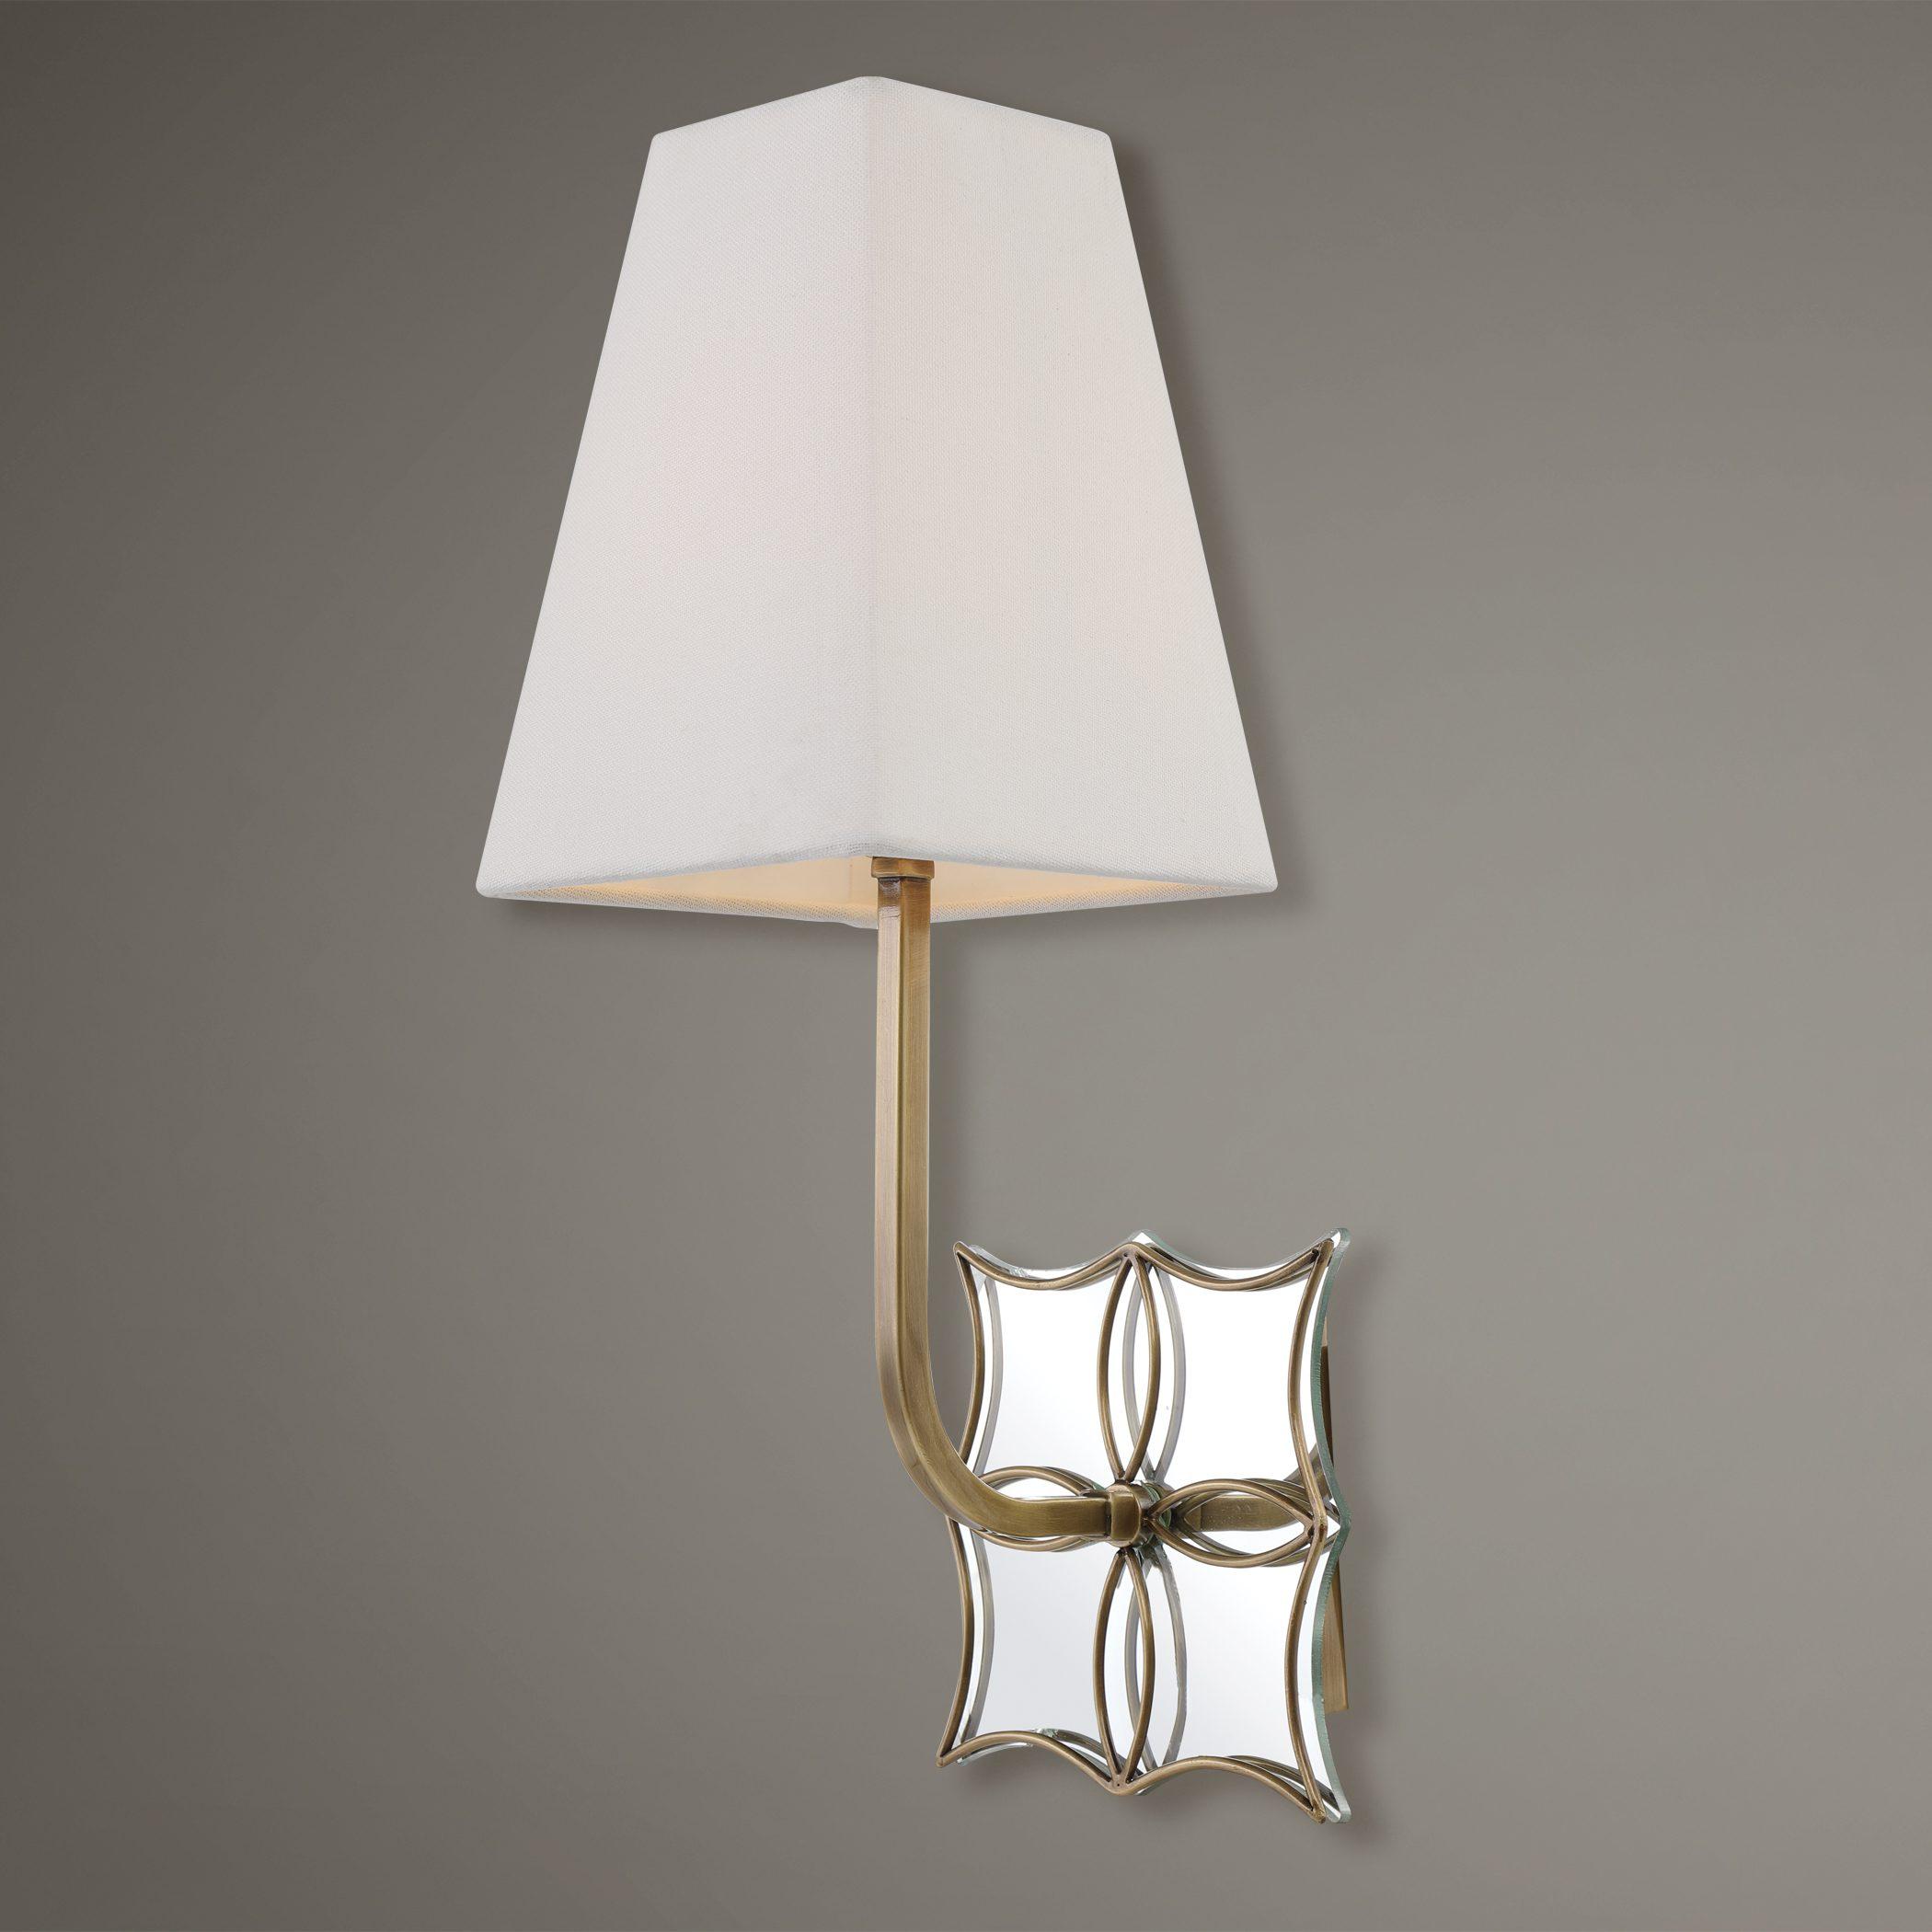 Uttermost Theodora Brass 1 Light Sconce